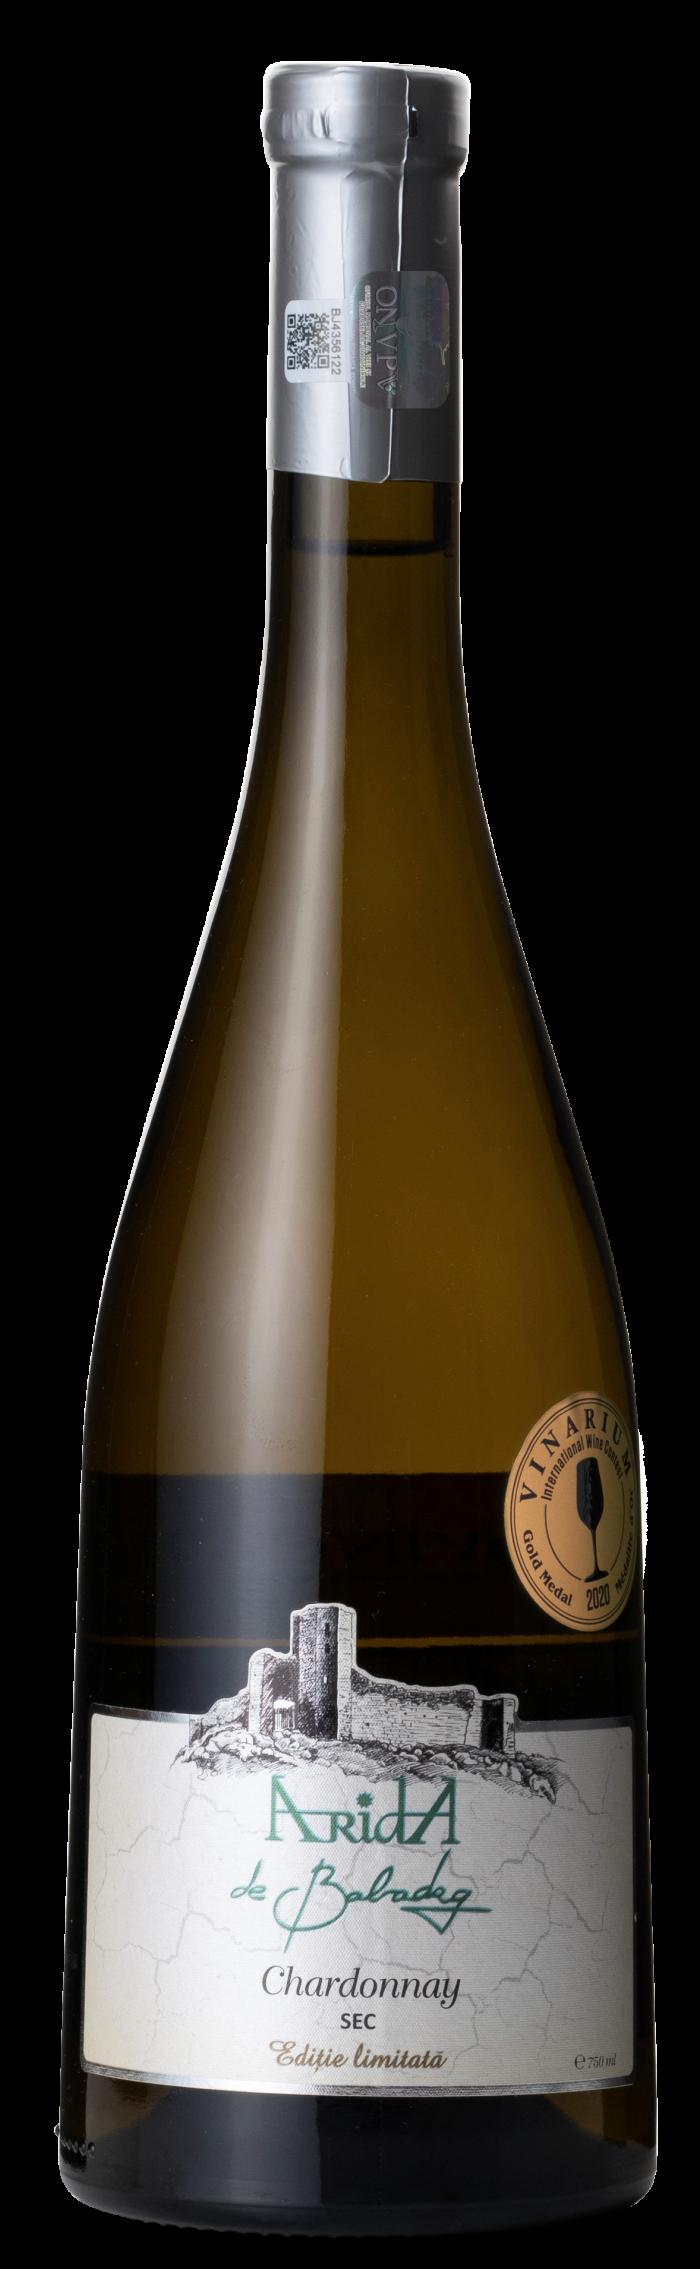 ARIDA de Babadag Chardonnay | Roemenië | gemaakt van de druif: Chardonnay